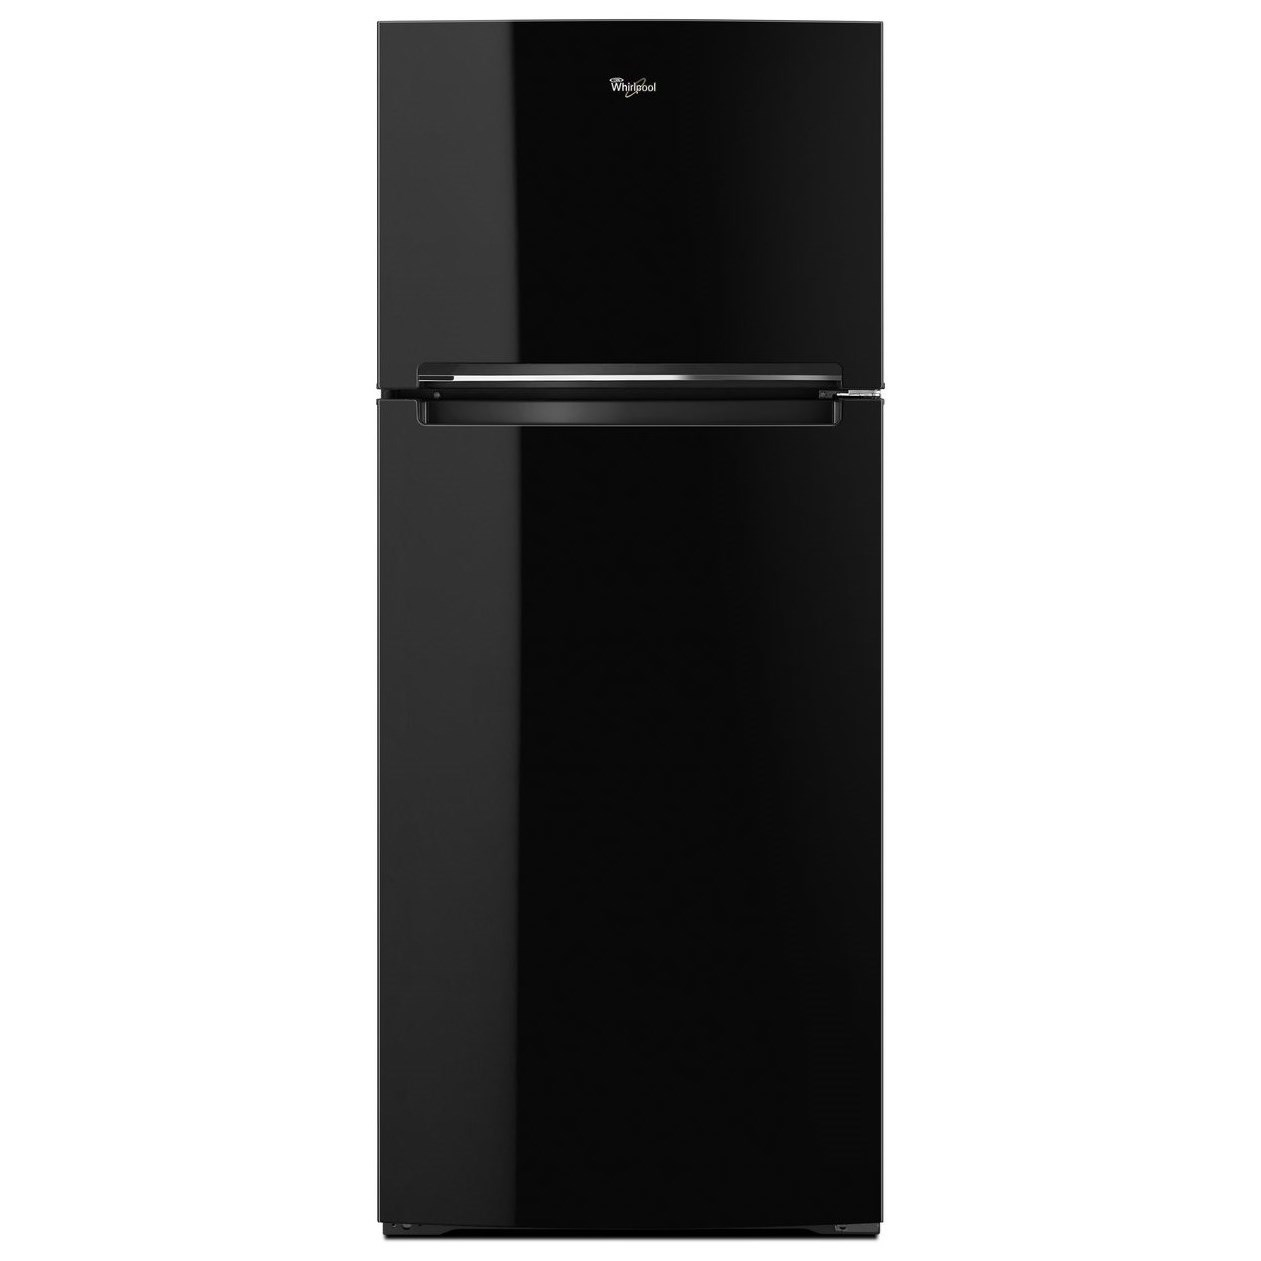 Whirlpool Top Mount Refrigerators 28-inch Wide Whirlpool® Refrigerator - Item Number: WRT518SZFB